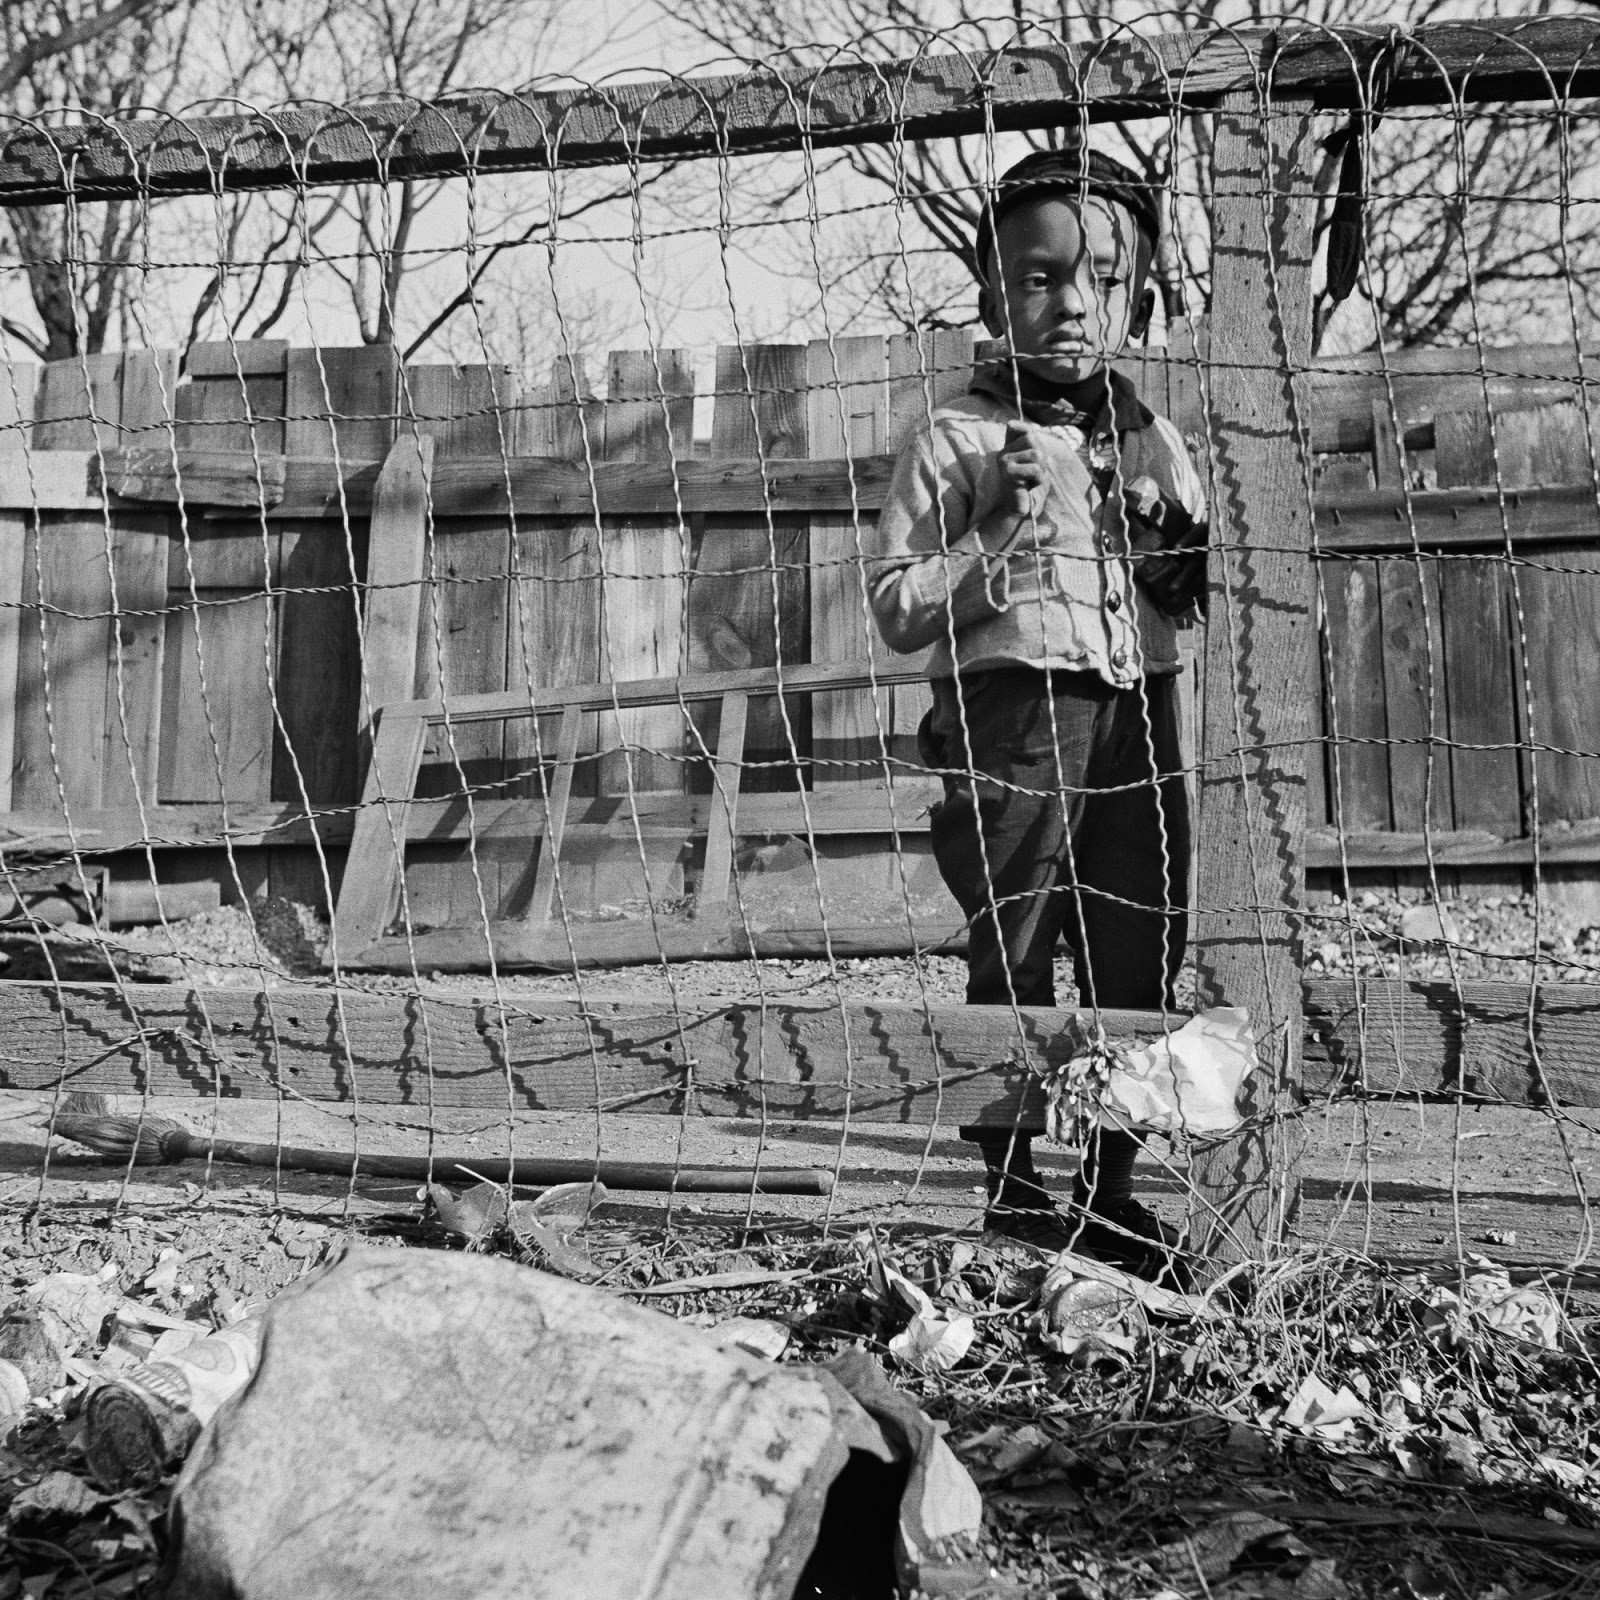 Identifying Black Urbanists